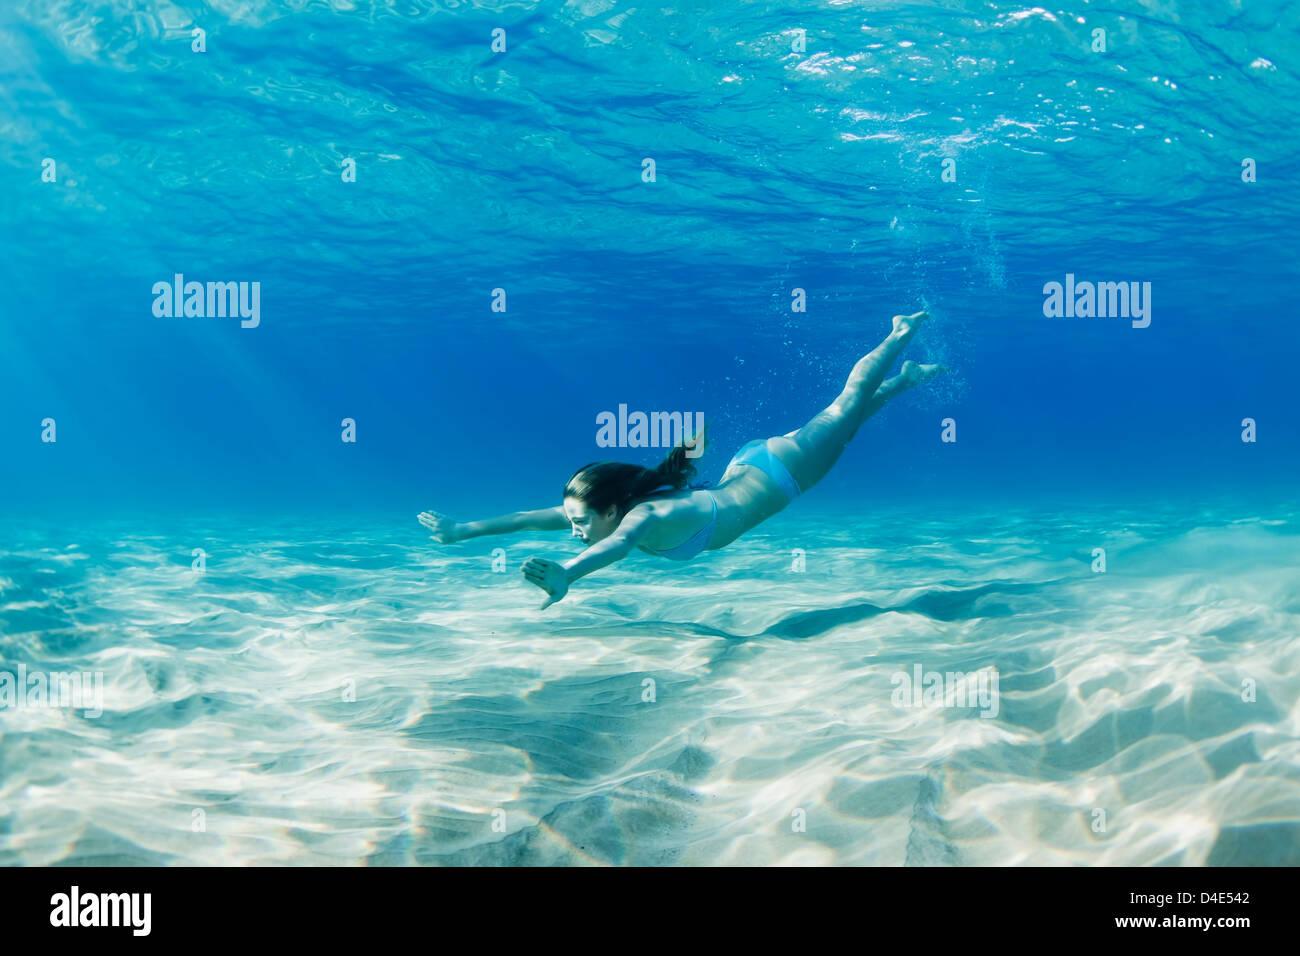 Amazing Hawaii, Maui, Makena, Young Woman Swimming Along The Ocean Floor.